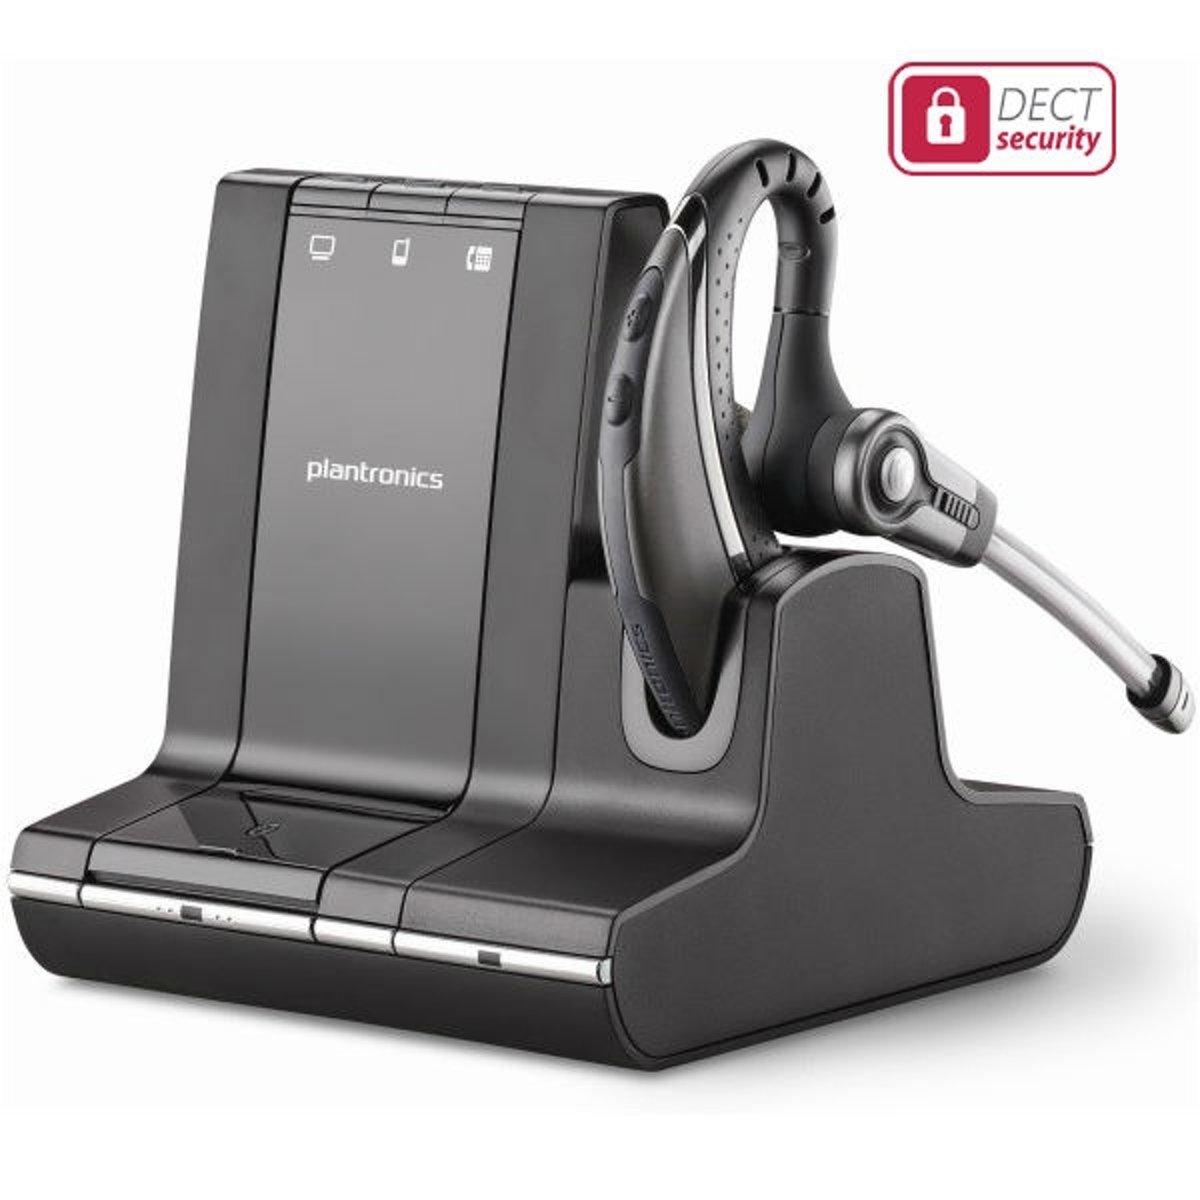 Plantronics Savi W730 Telefoonheadset DECT Draadloos, Mono In Ear Zwart, Zilver